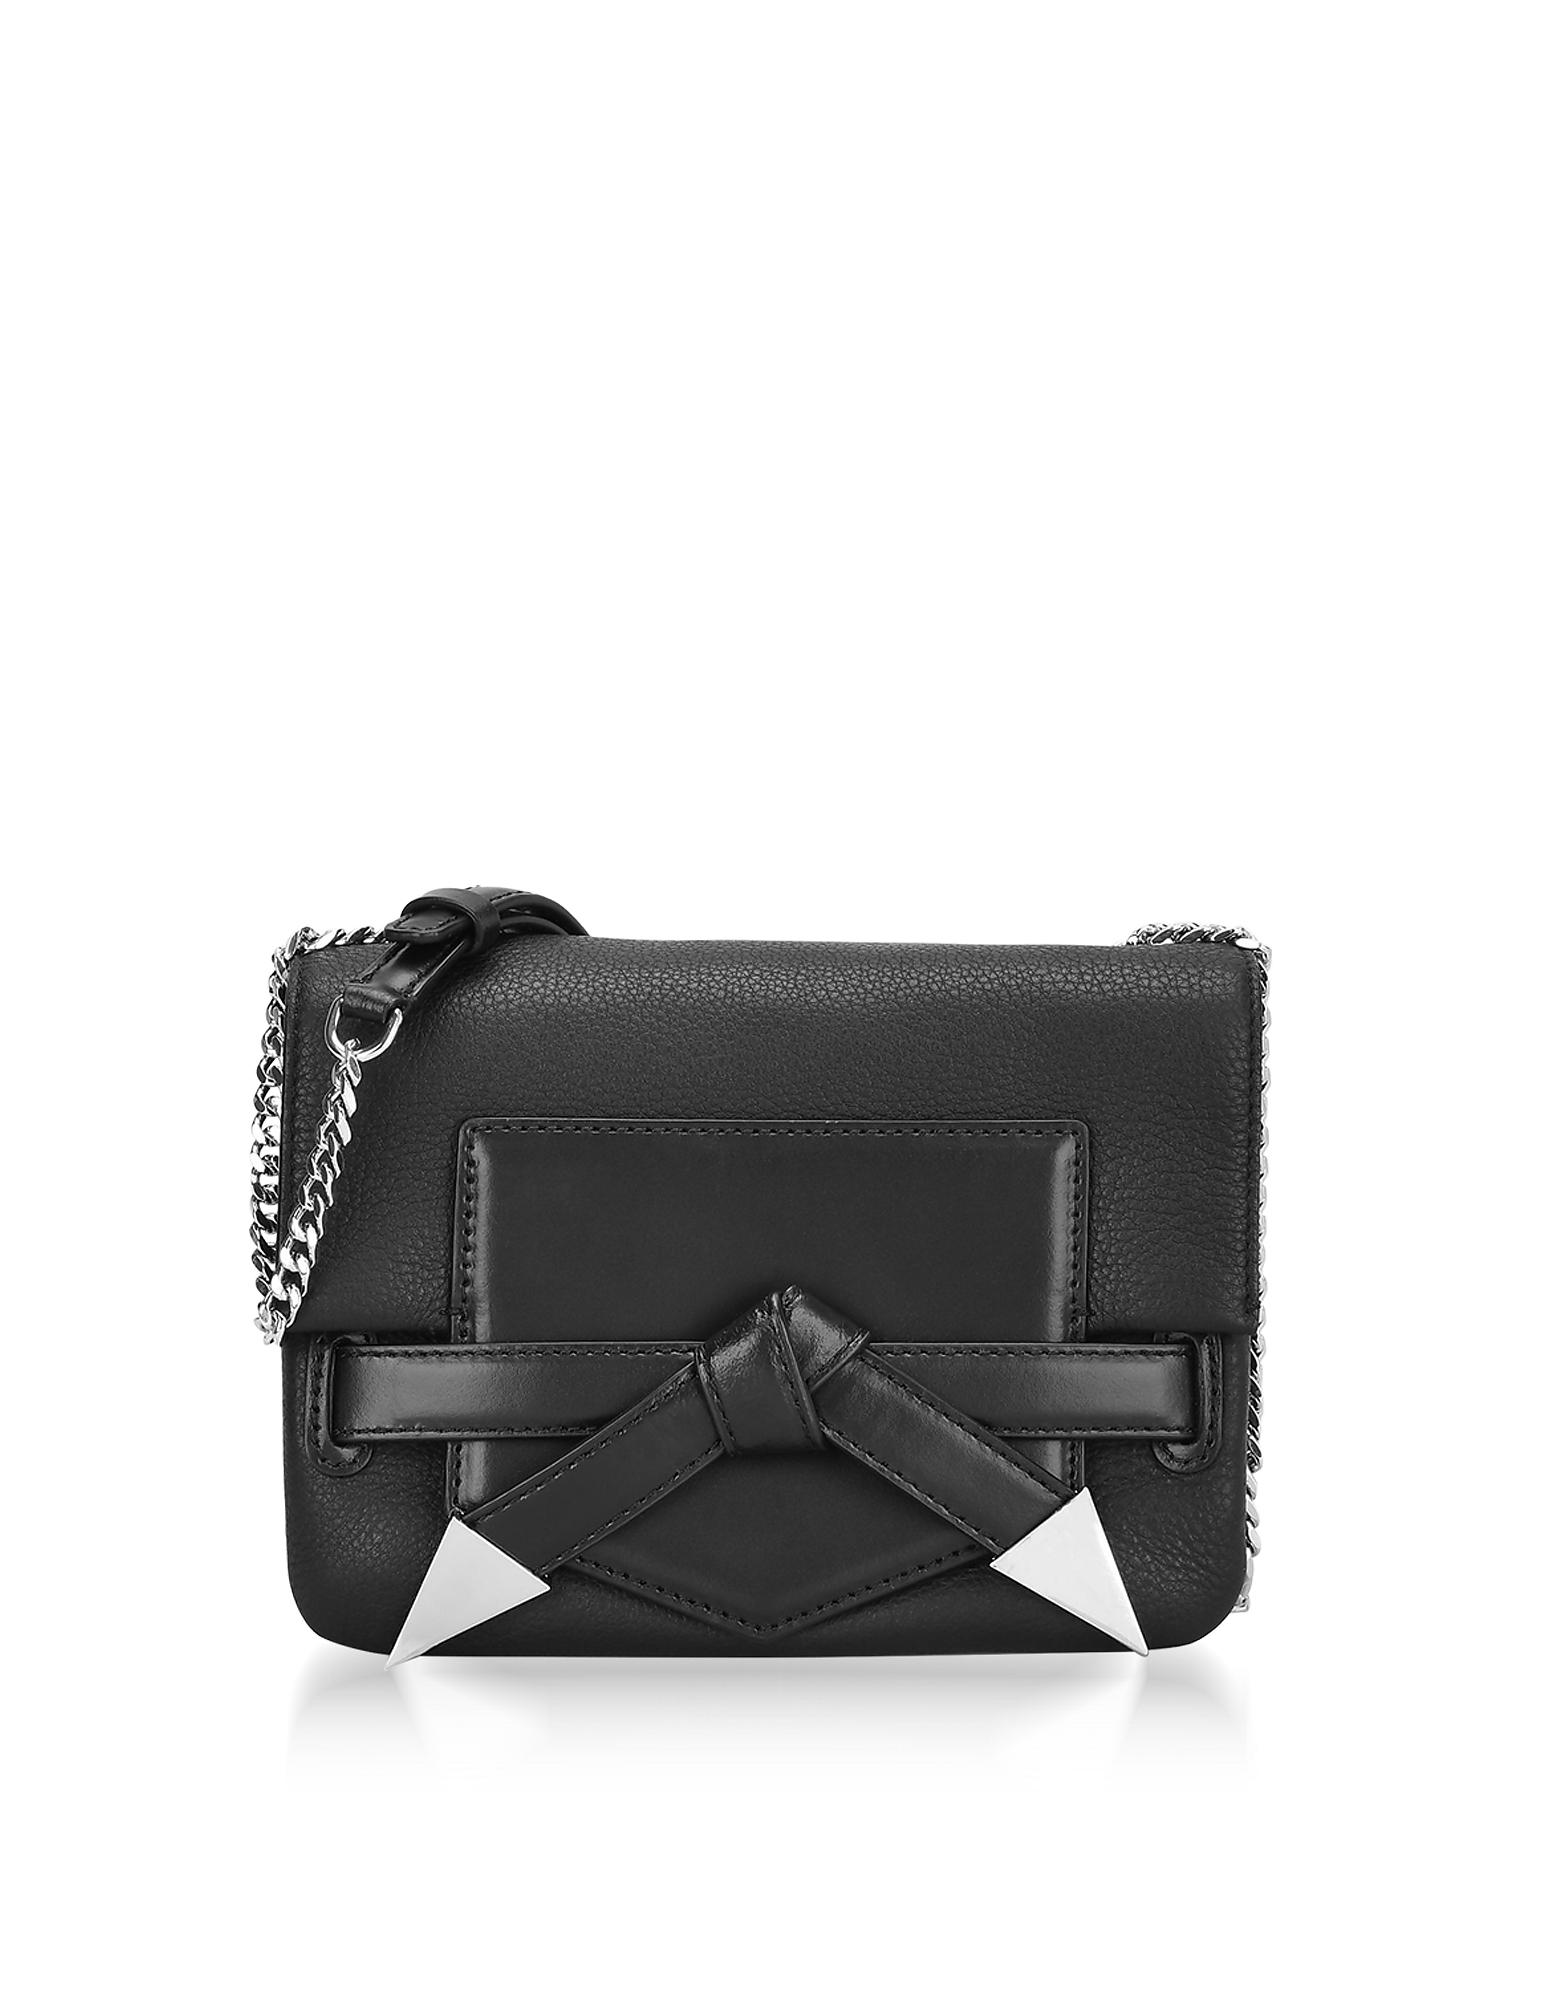 Karl Lagerfeld Handbags, Black Leather K/Rocky Bow Crossbody Bag